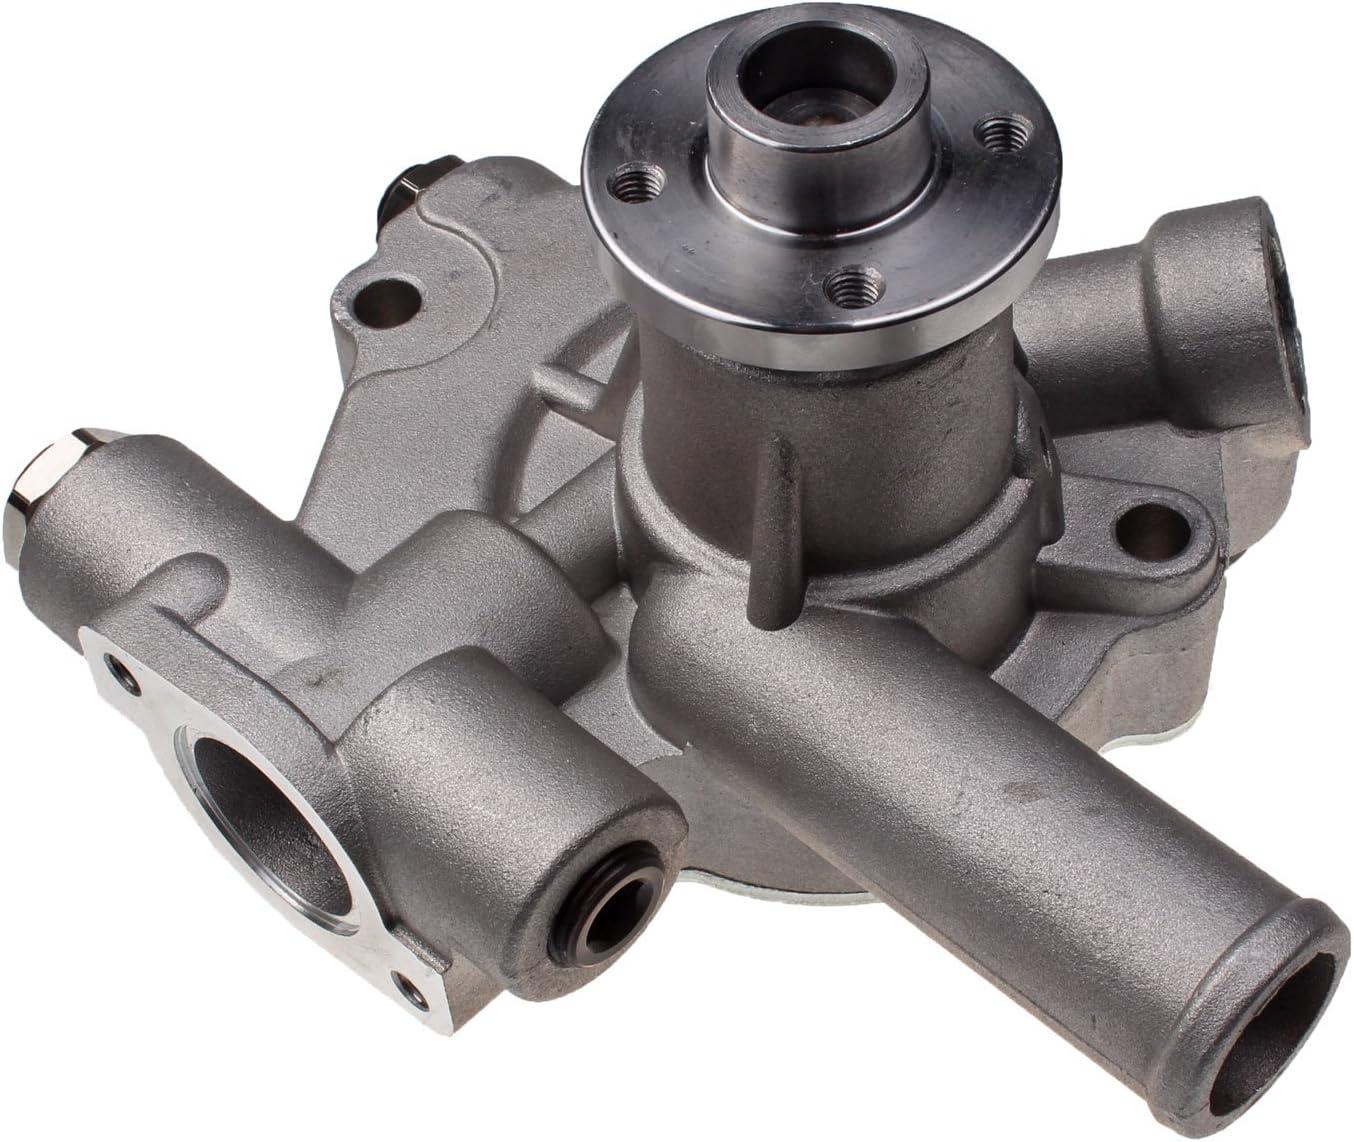 New Water Pump 13-506 for YANMAR TK 2.44 2.49 3.66 3.74 Engine